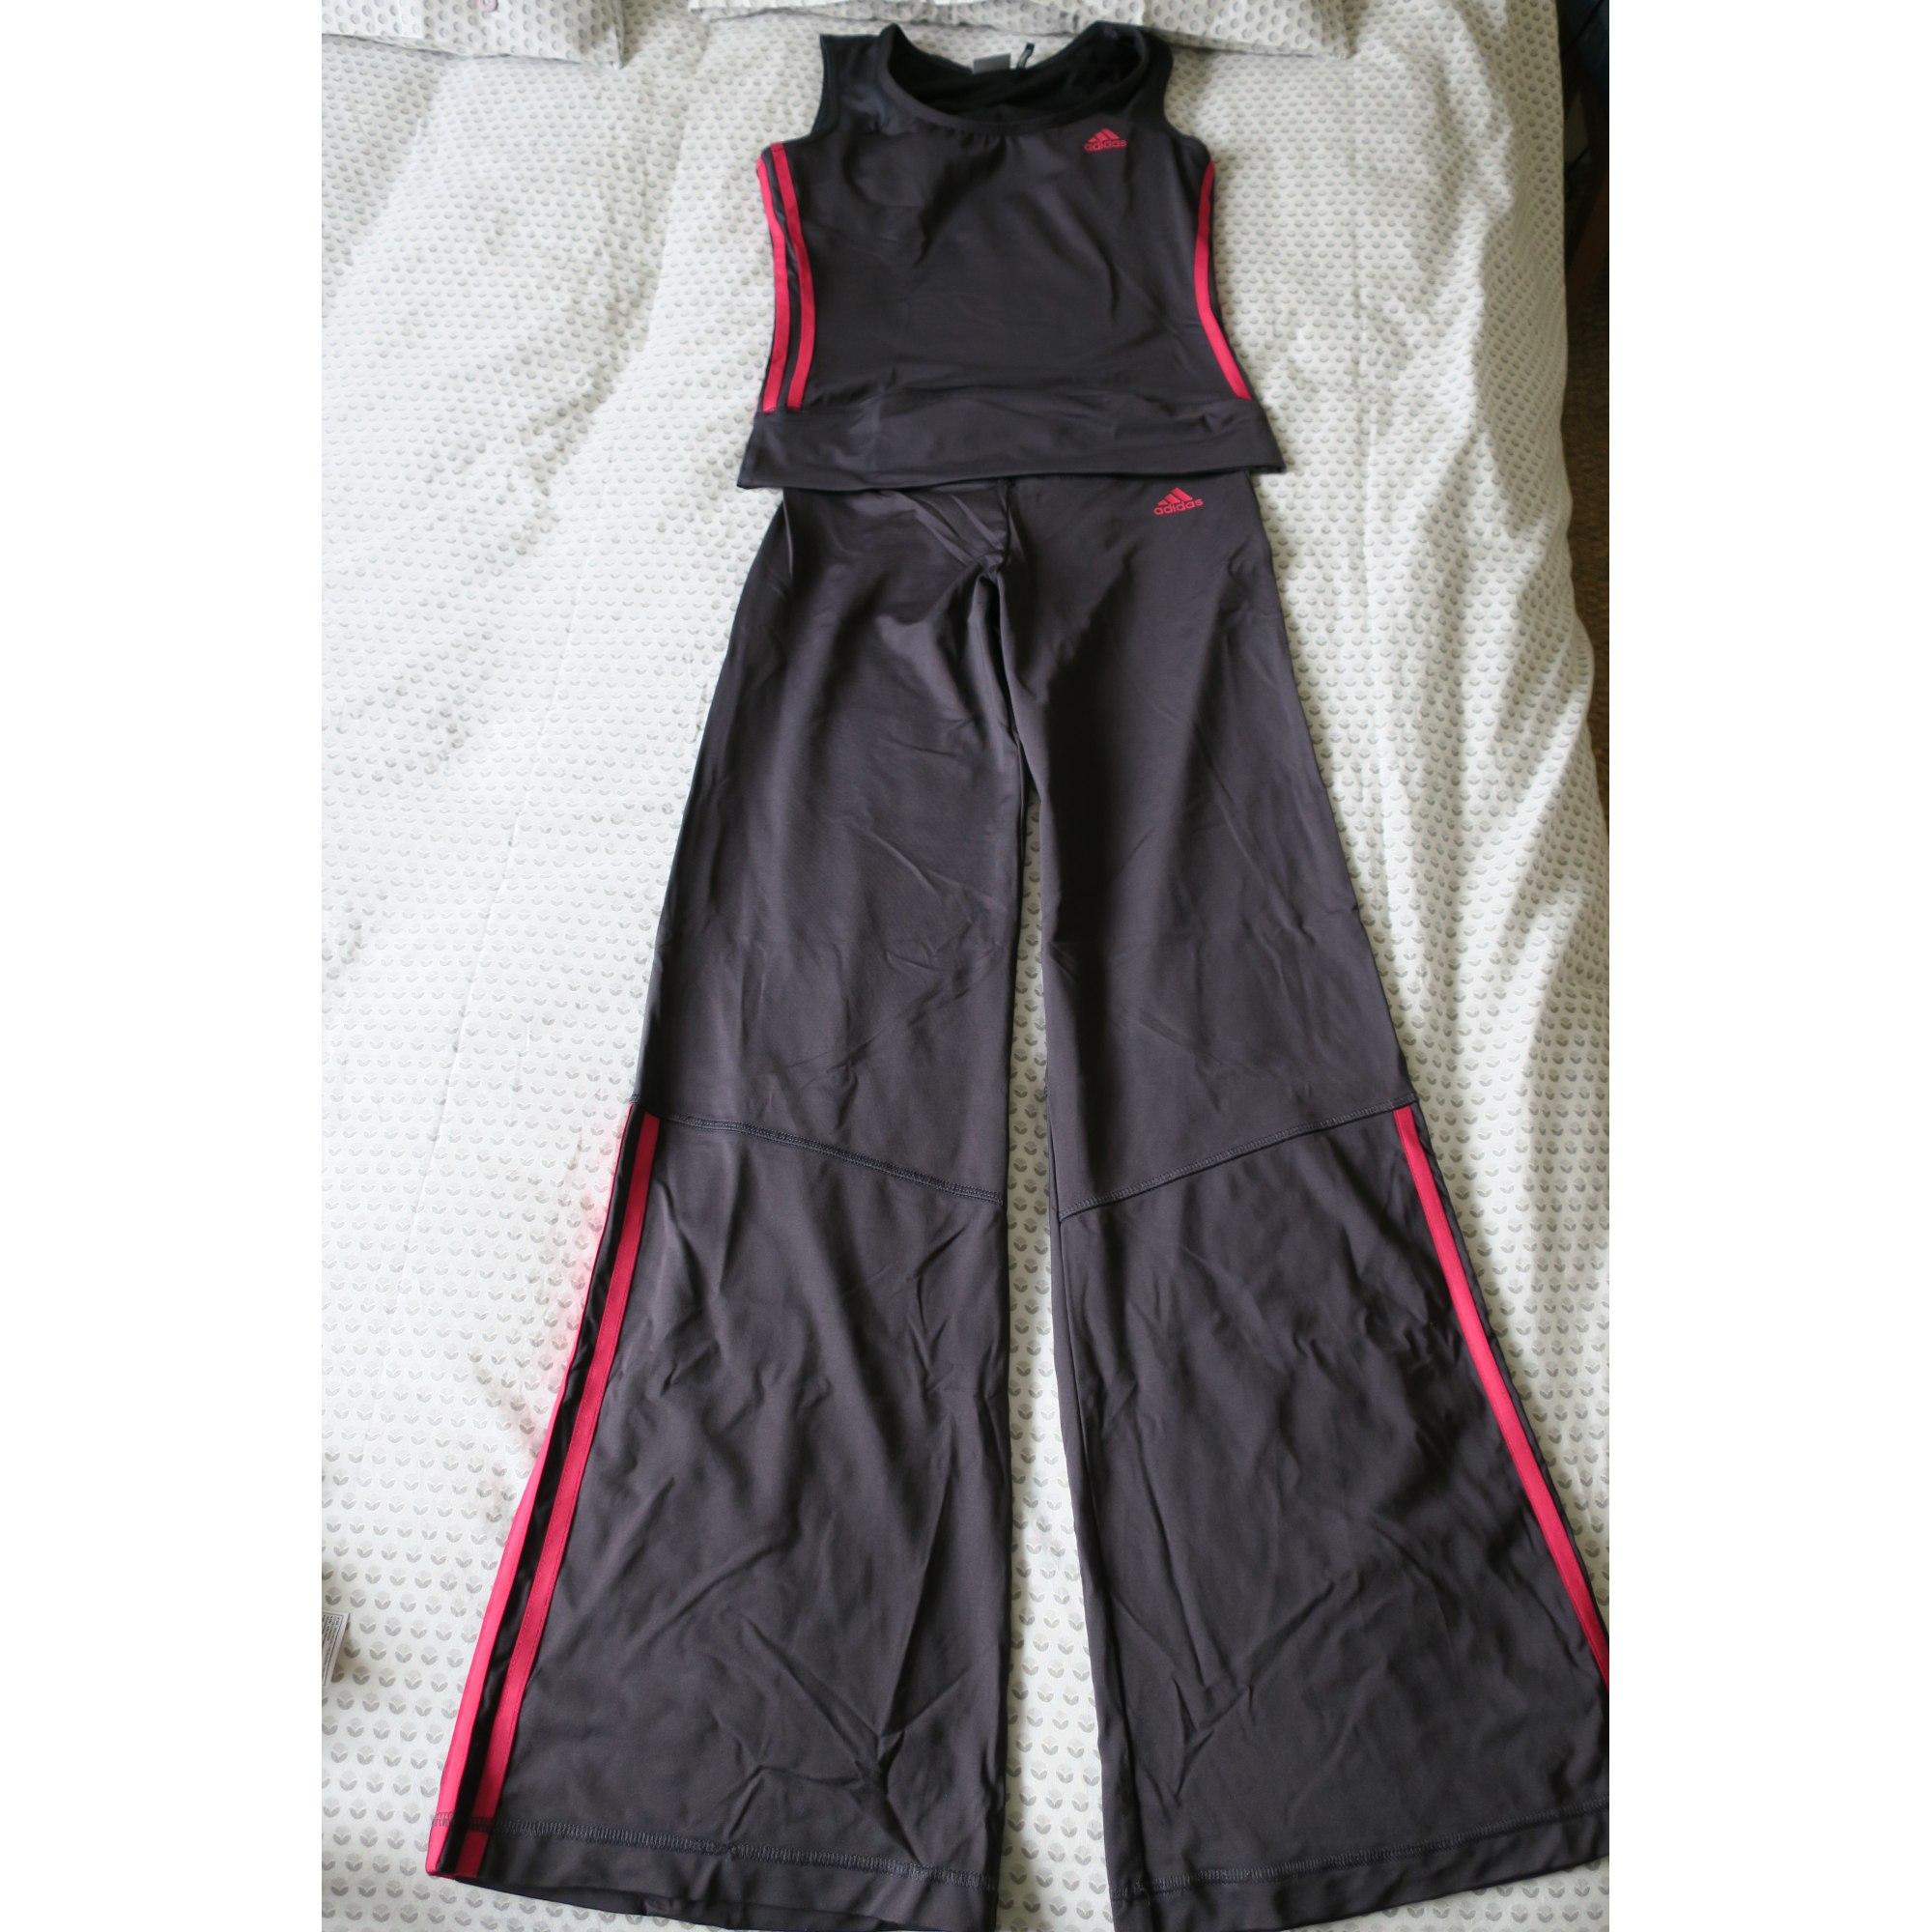 De Adidas 5581974 Fitness 36 Pantalon s T1 Gris UqdEwf0